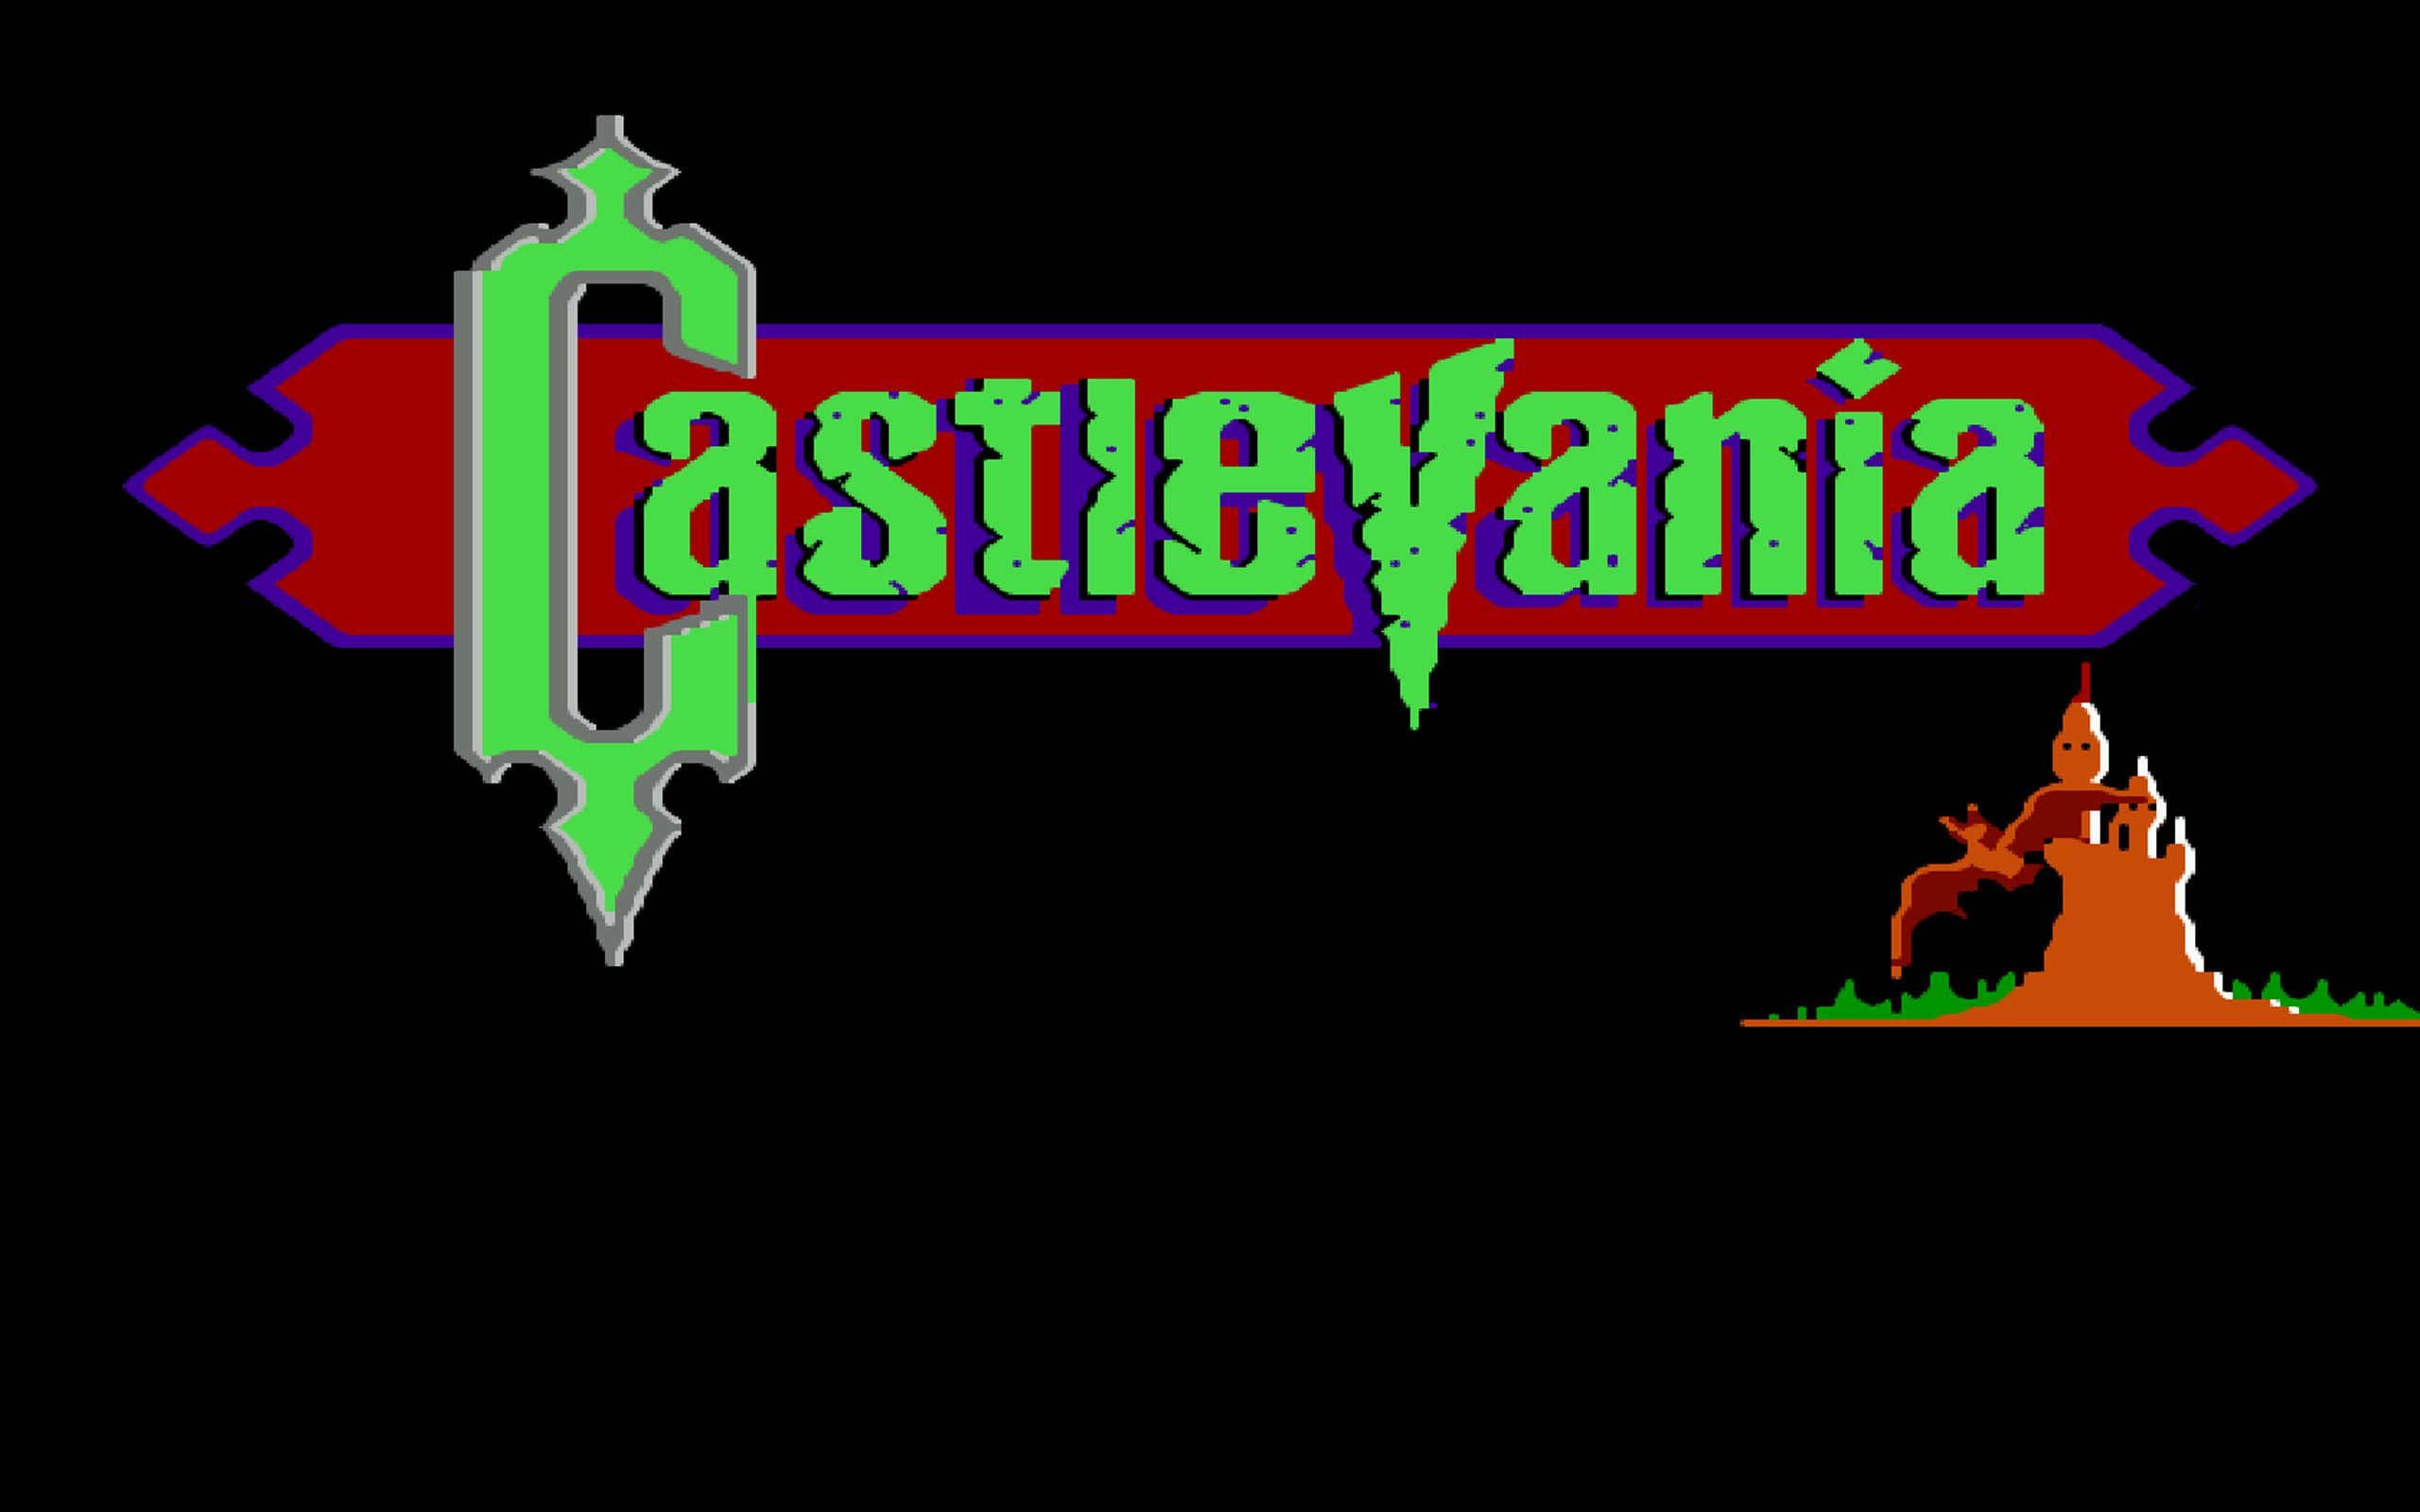 Castlevania NES Logo Castlevania nes, Logos, Neon signs